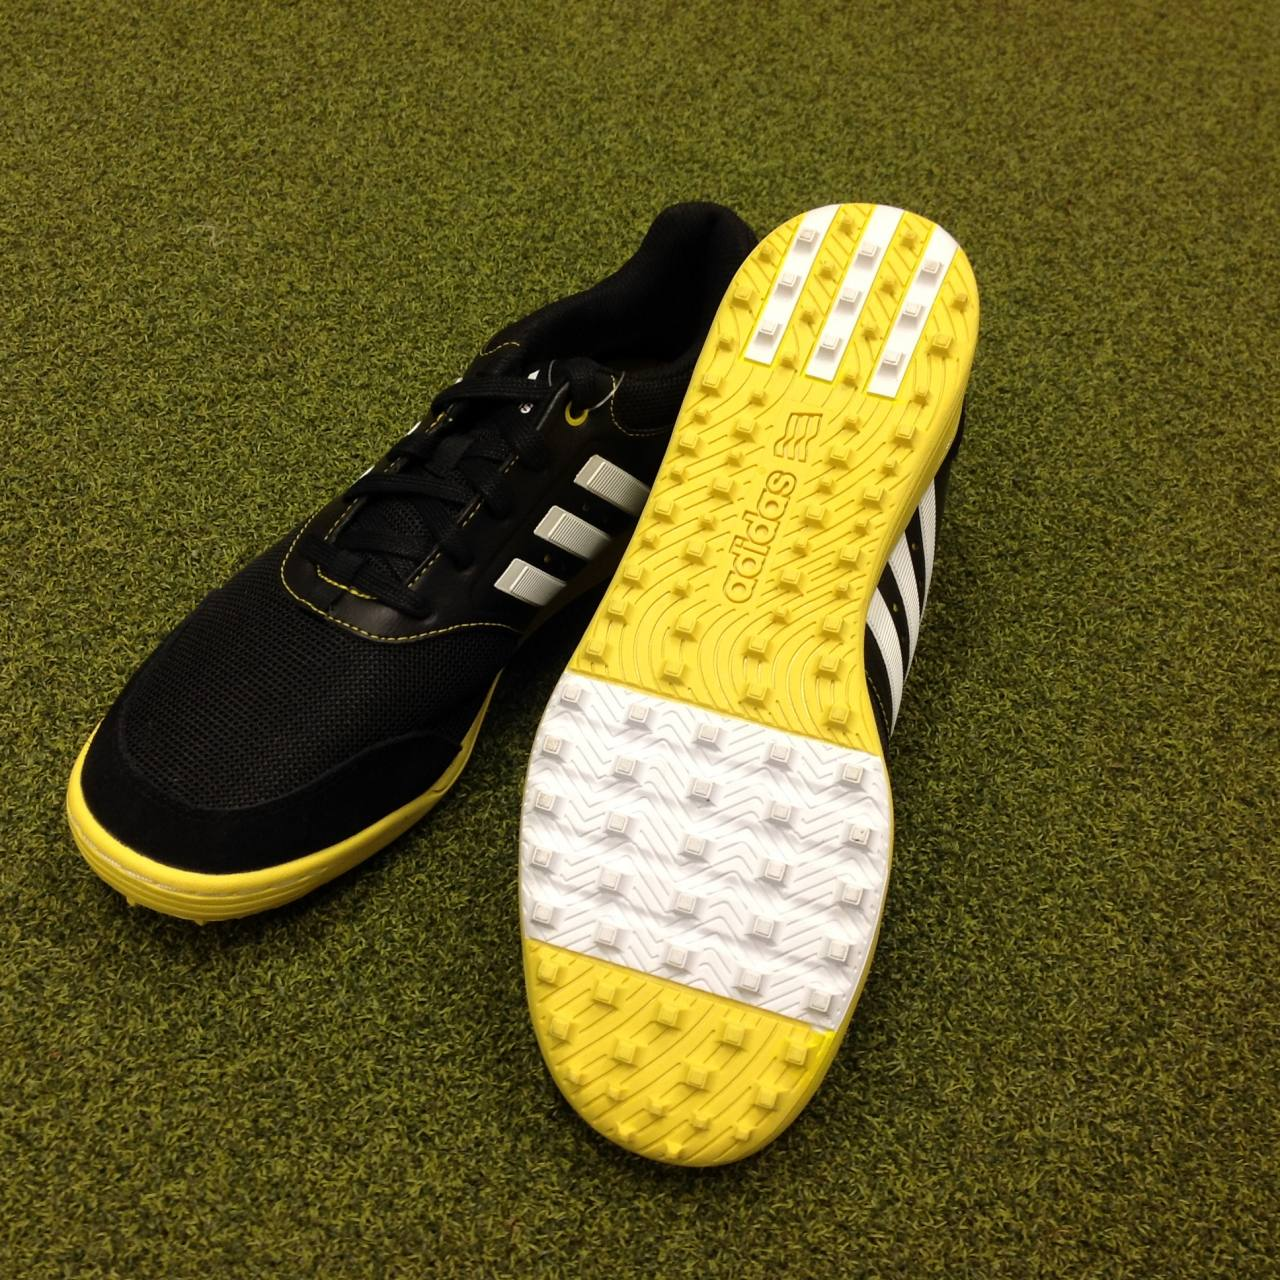 NEW Adidas Adicross III Golf Shoes UK Size 8.5 US 9 EU